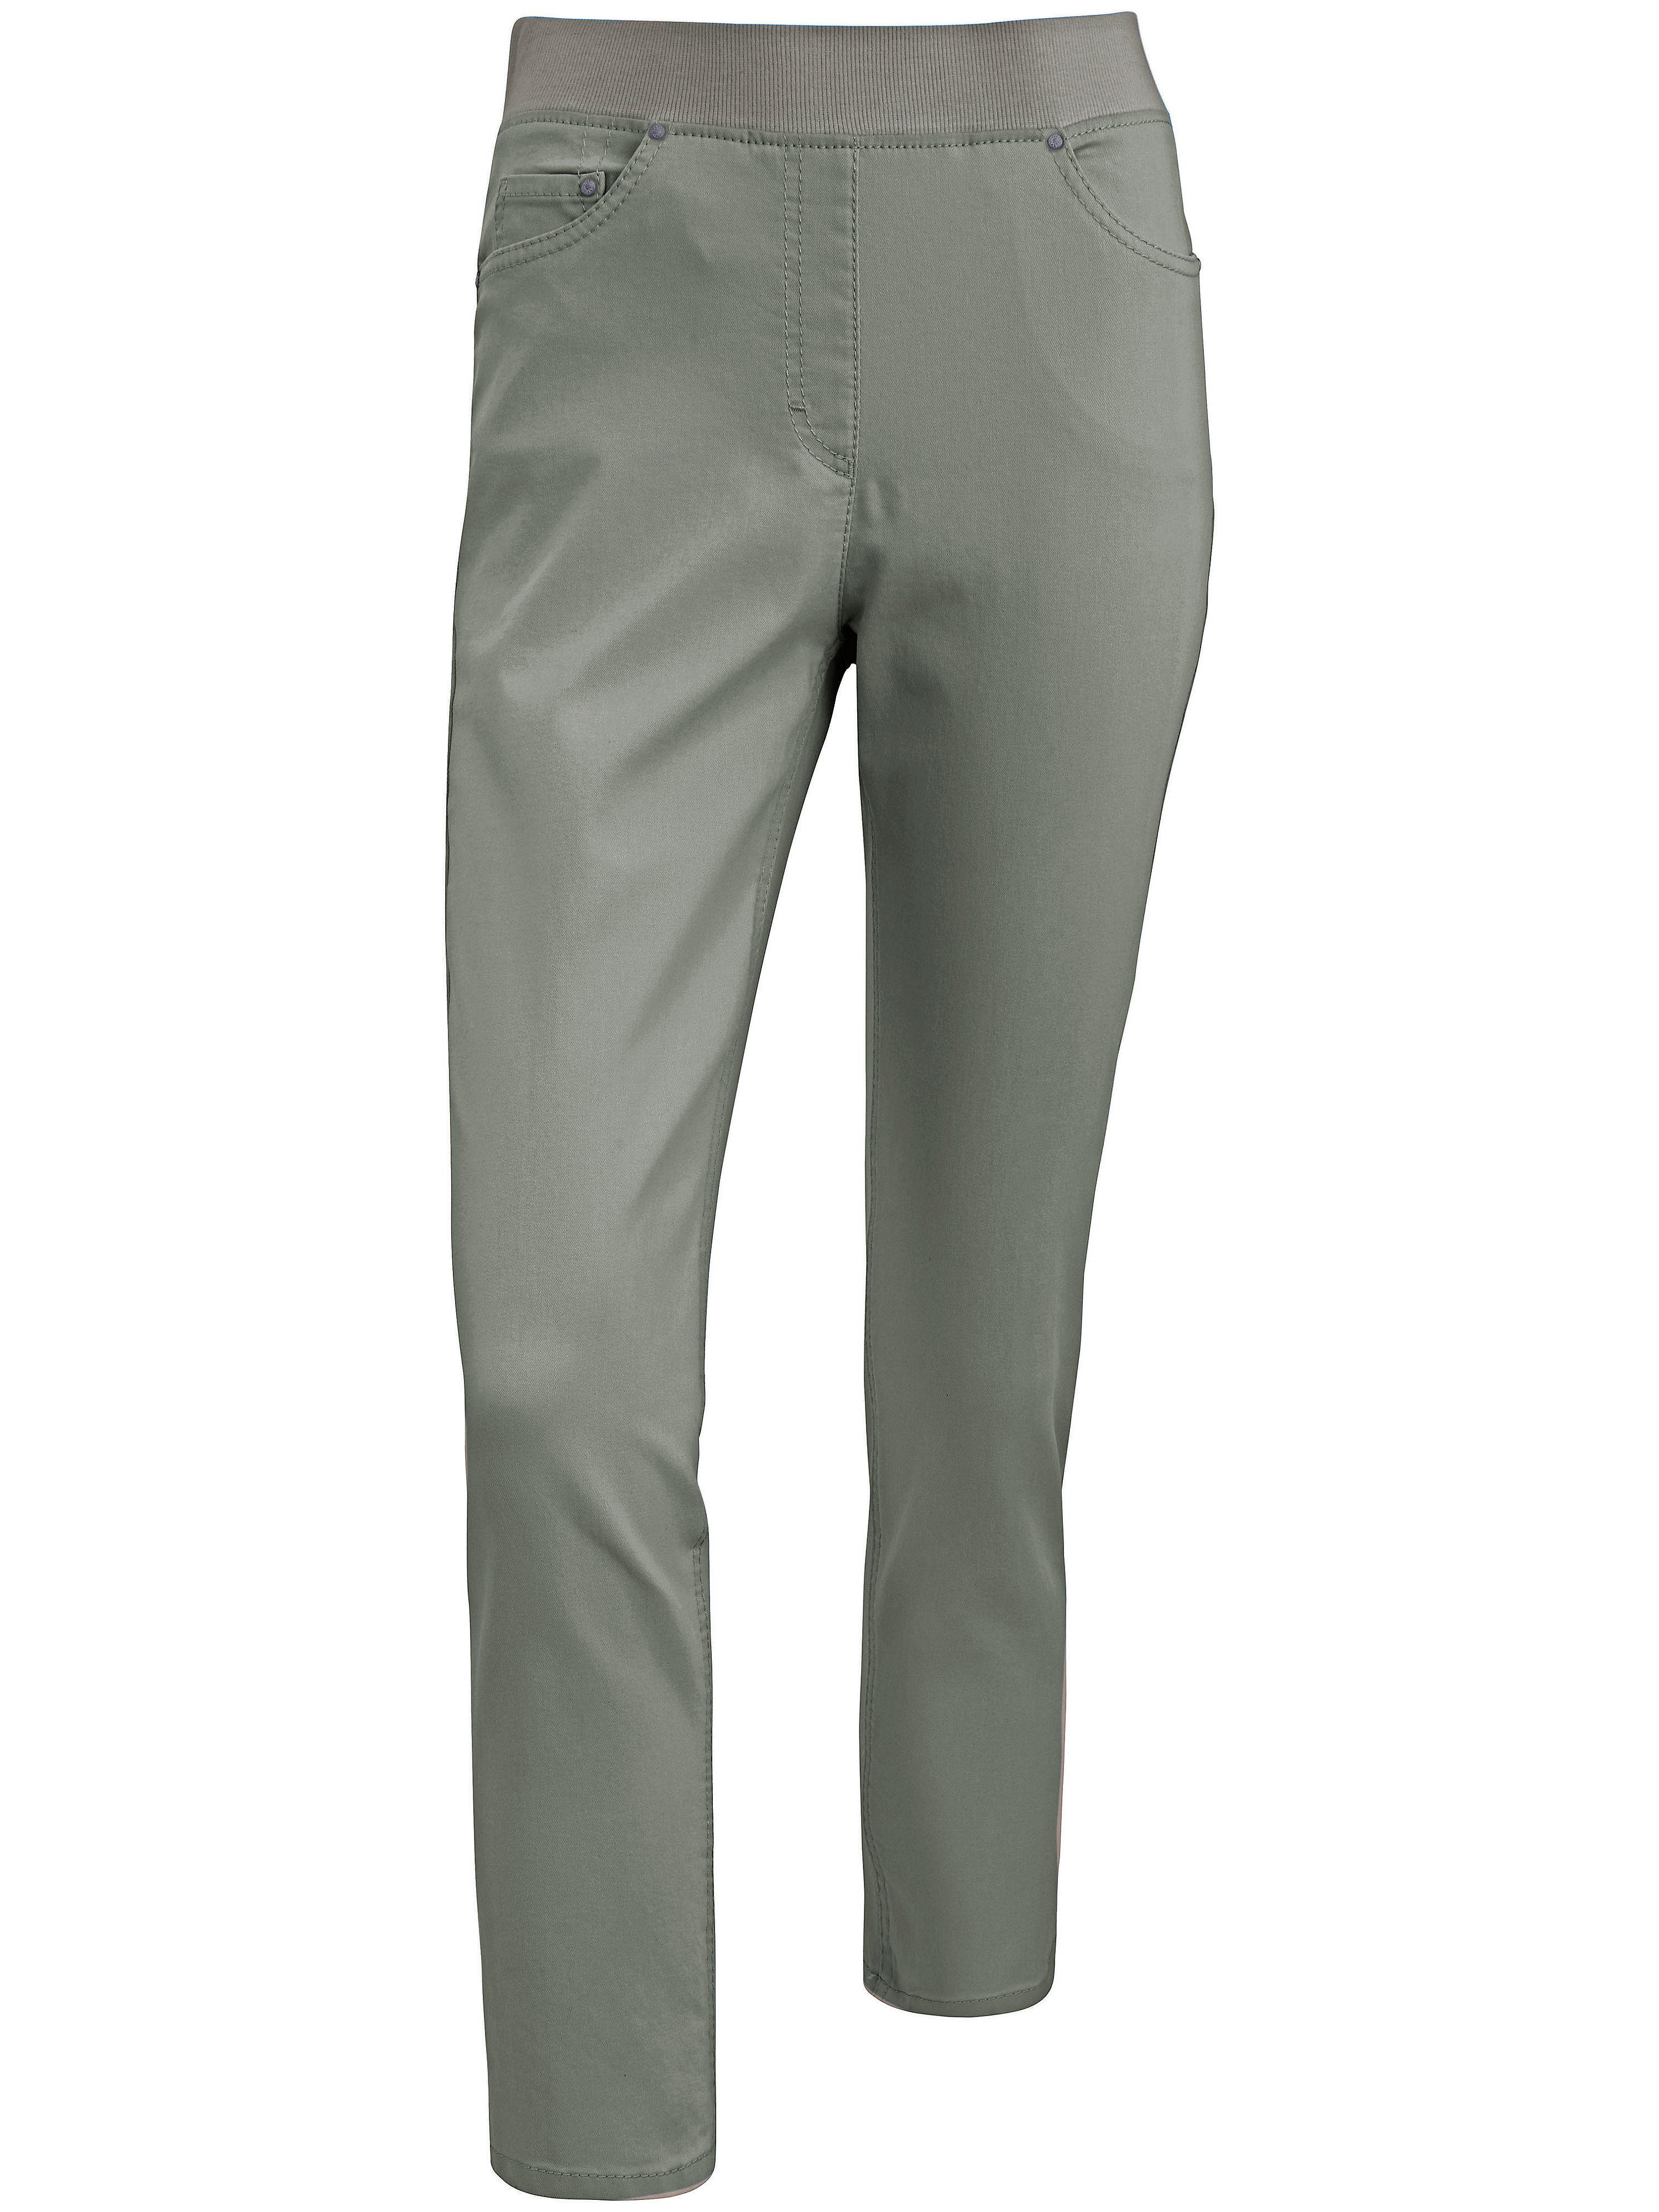 Damen Raphaela by Brax Comfort Plus-7 8-Schlupf-Jeans Modell Carina  denim | 04044812606650